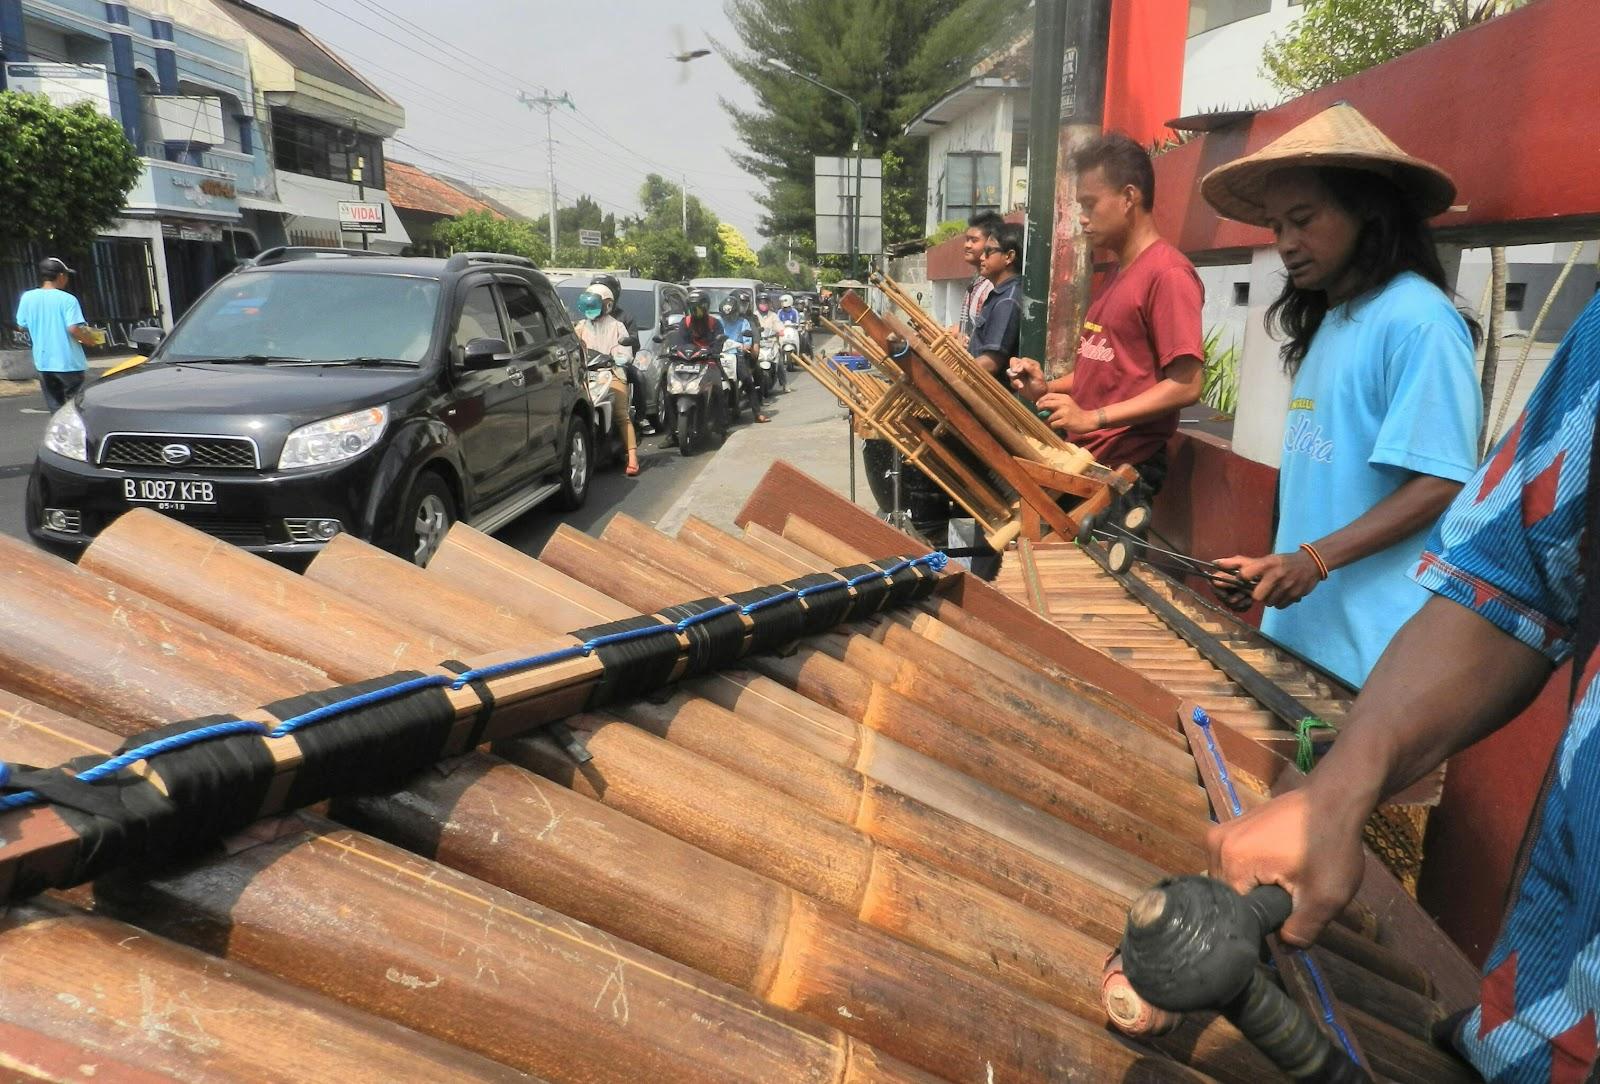 Hasil gambar untuk angklung jalanan Yogyakarta